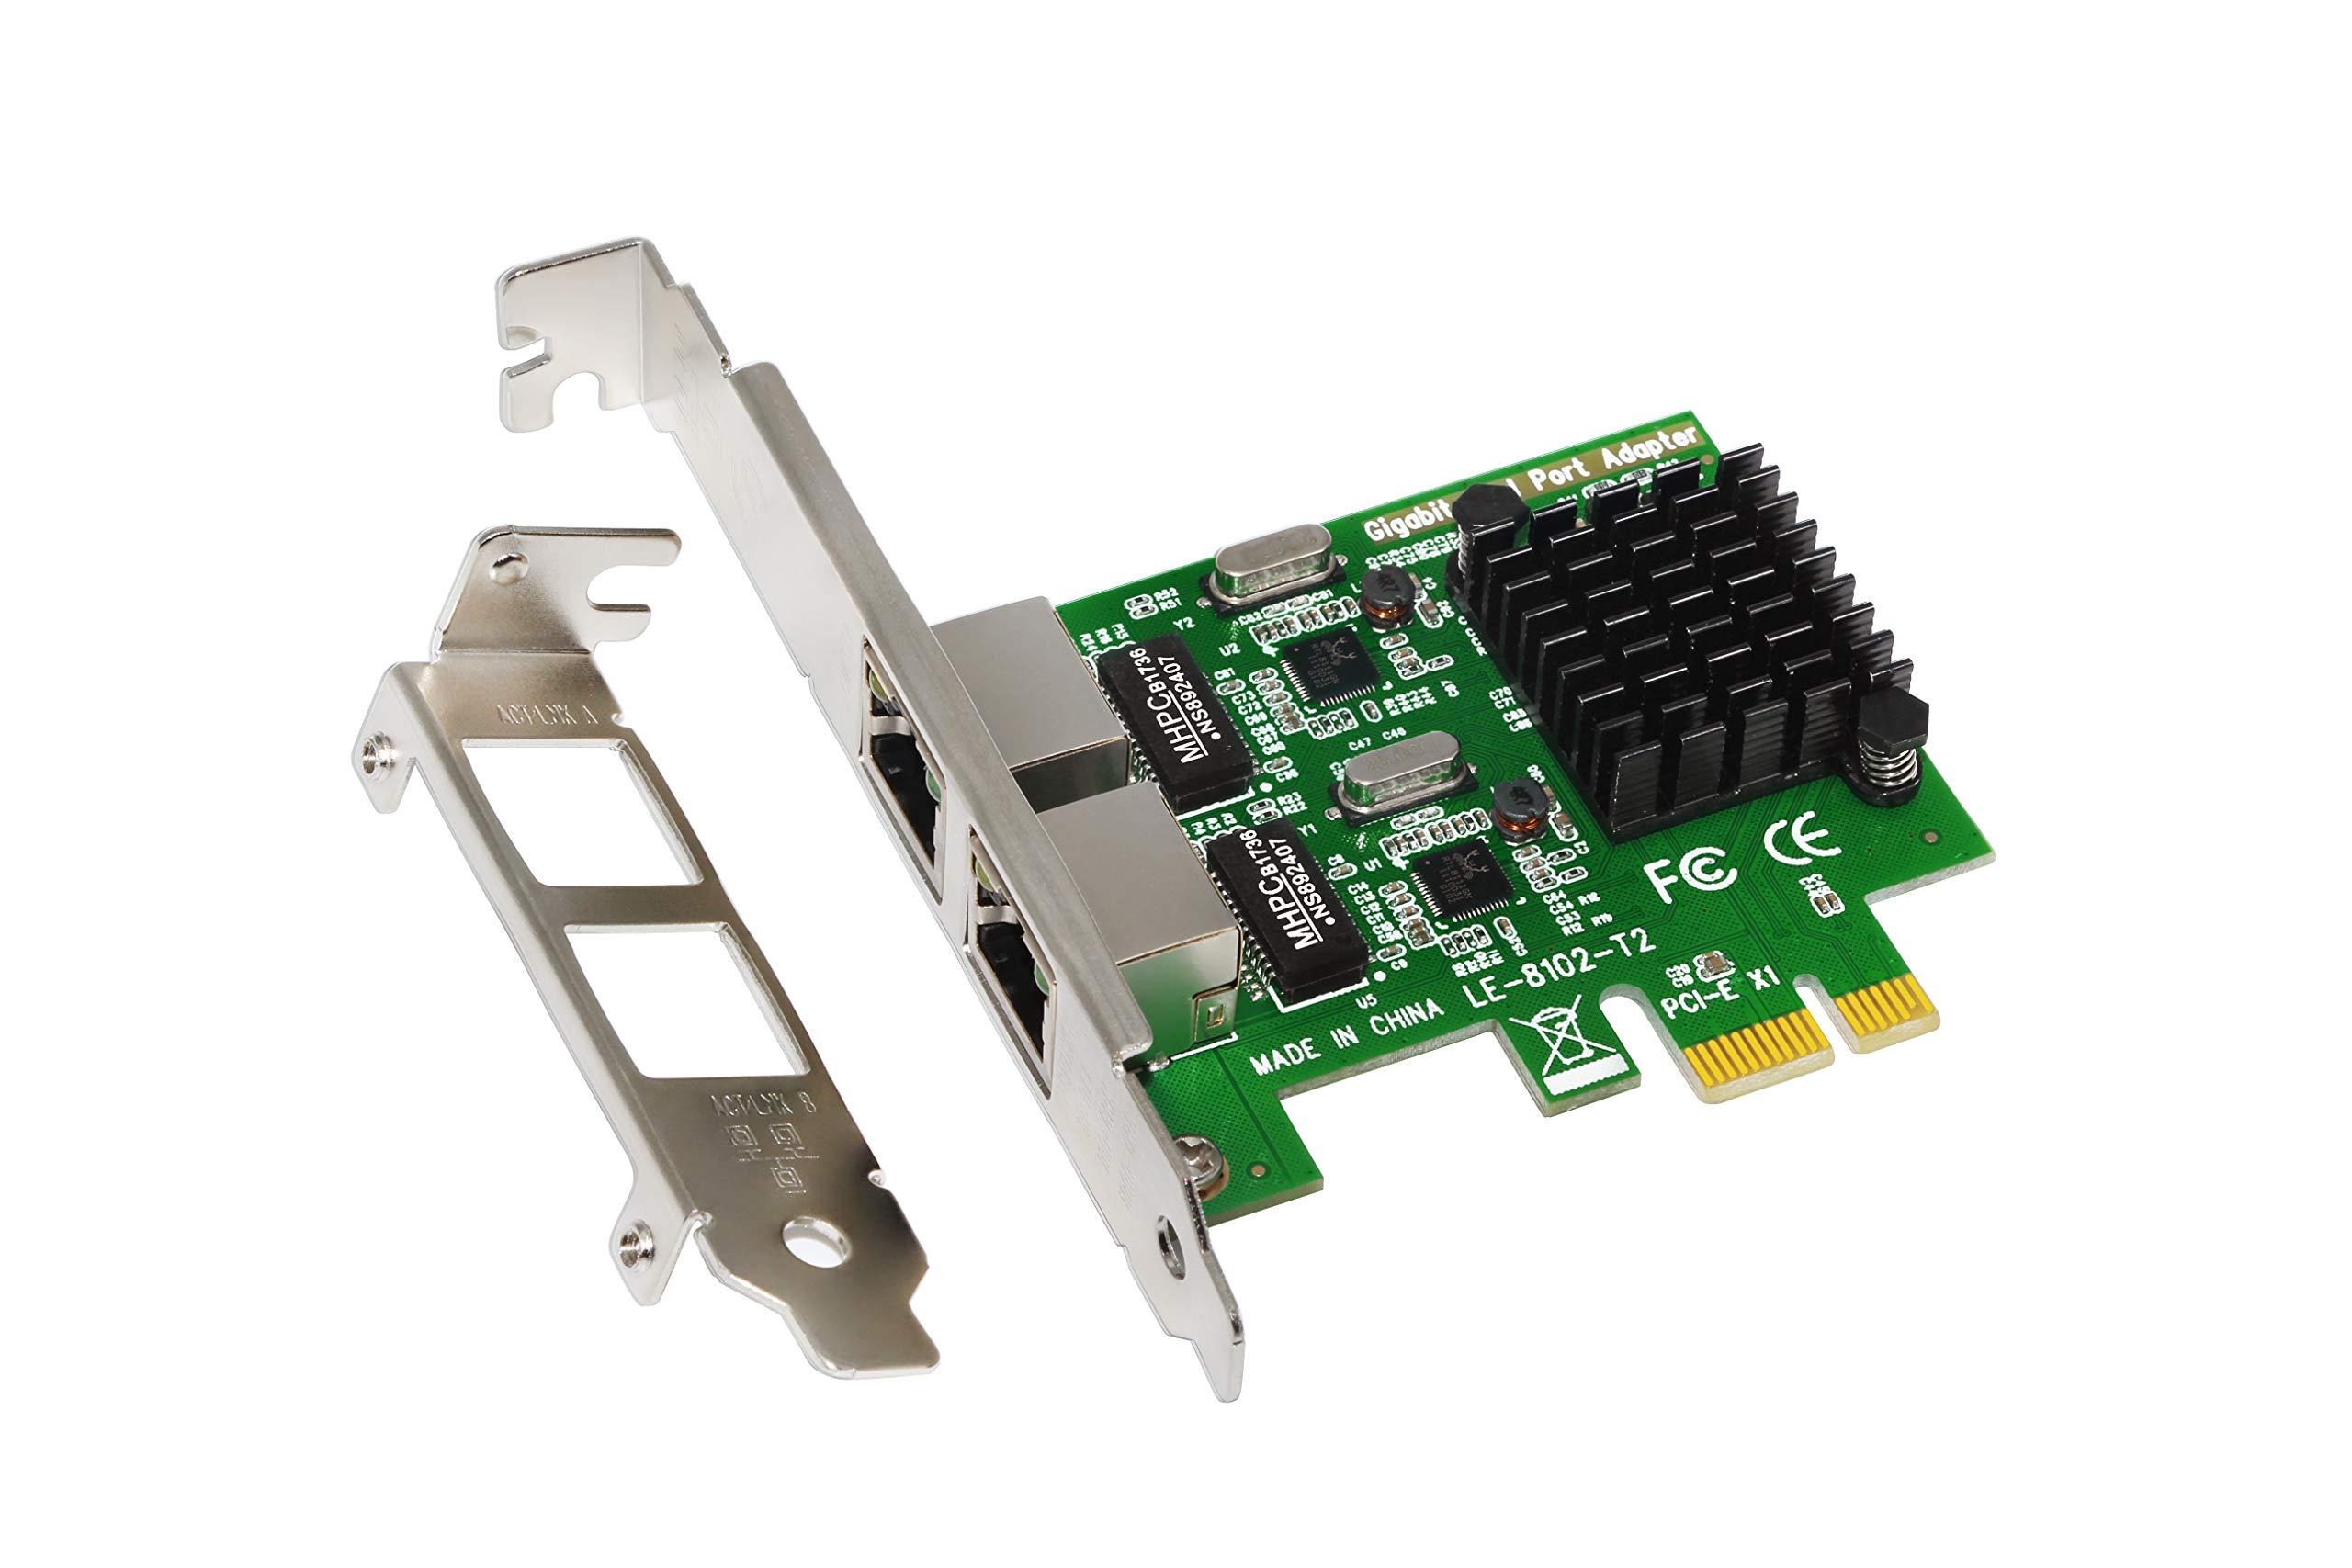 Padarsey RJ45 x 2 Gigabit LAN, tarjeta controladora de red PCI Express PCI-E Gigabit Ethernet, 10/100 / 1000mbps, tarjet